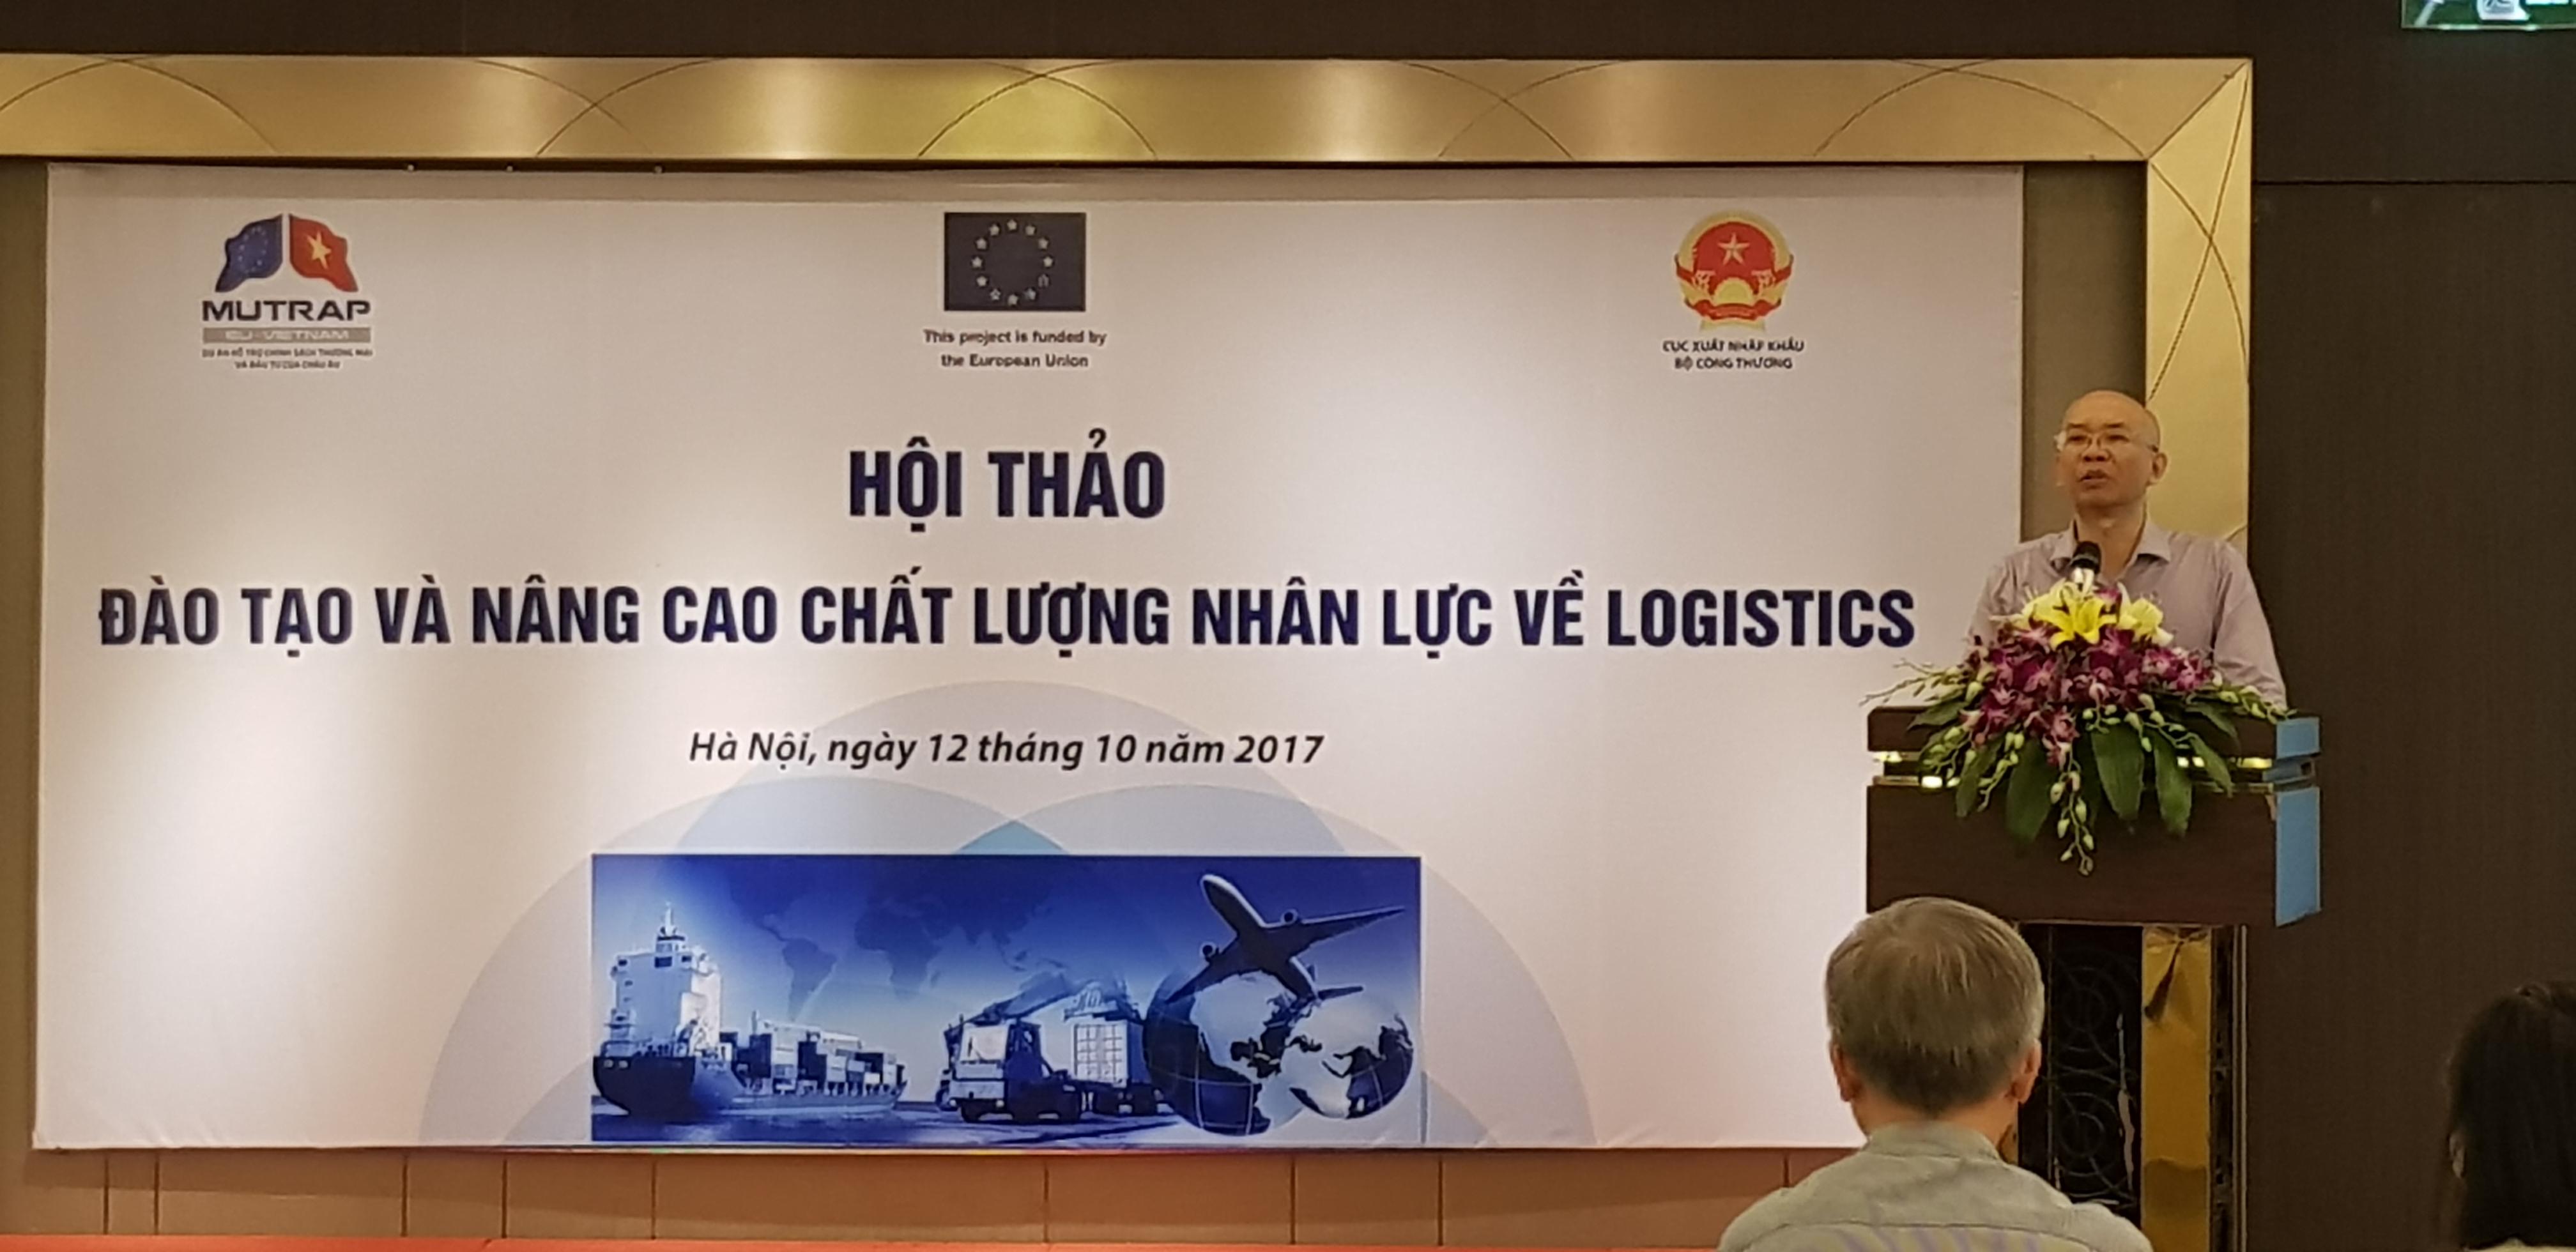 http://vietnamshipper.com/img/LVN-b.jpg